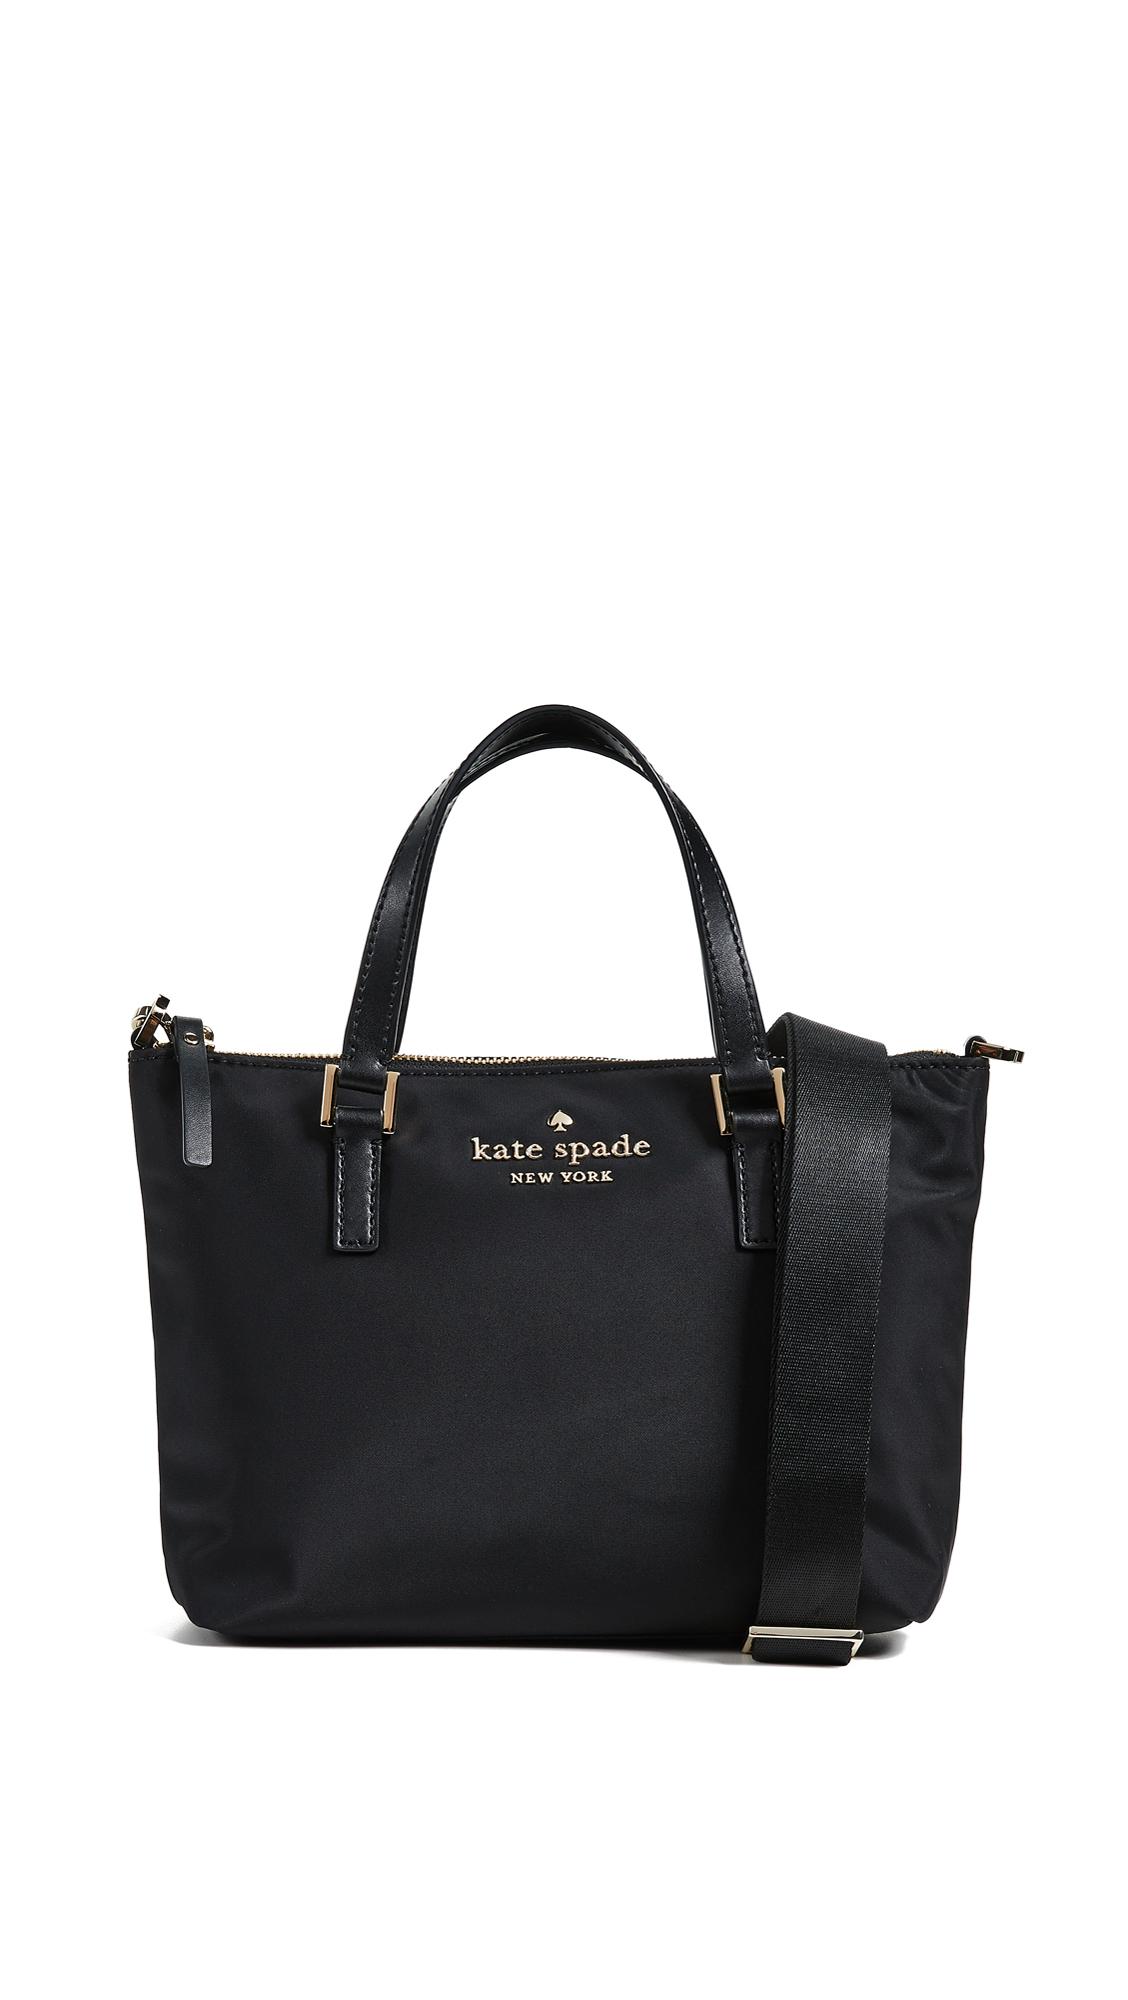 Kate Spade New York Lucie Cross Body Bag